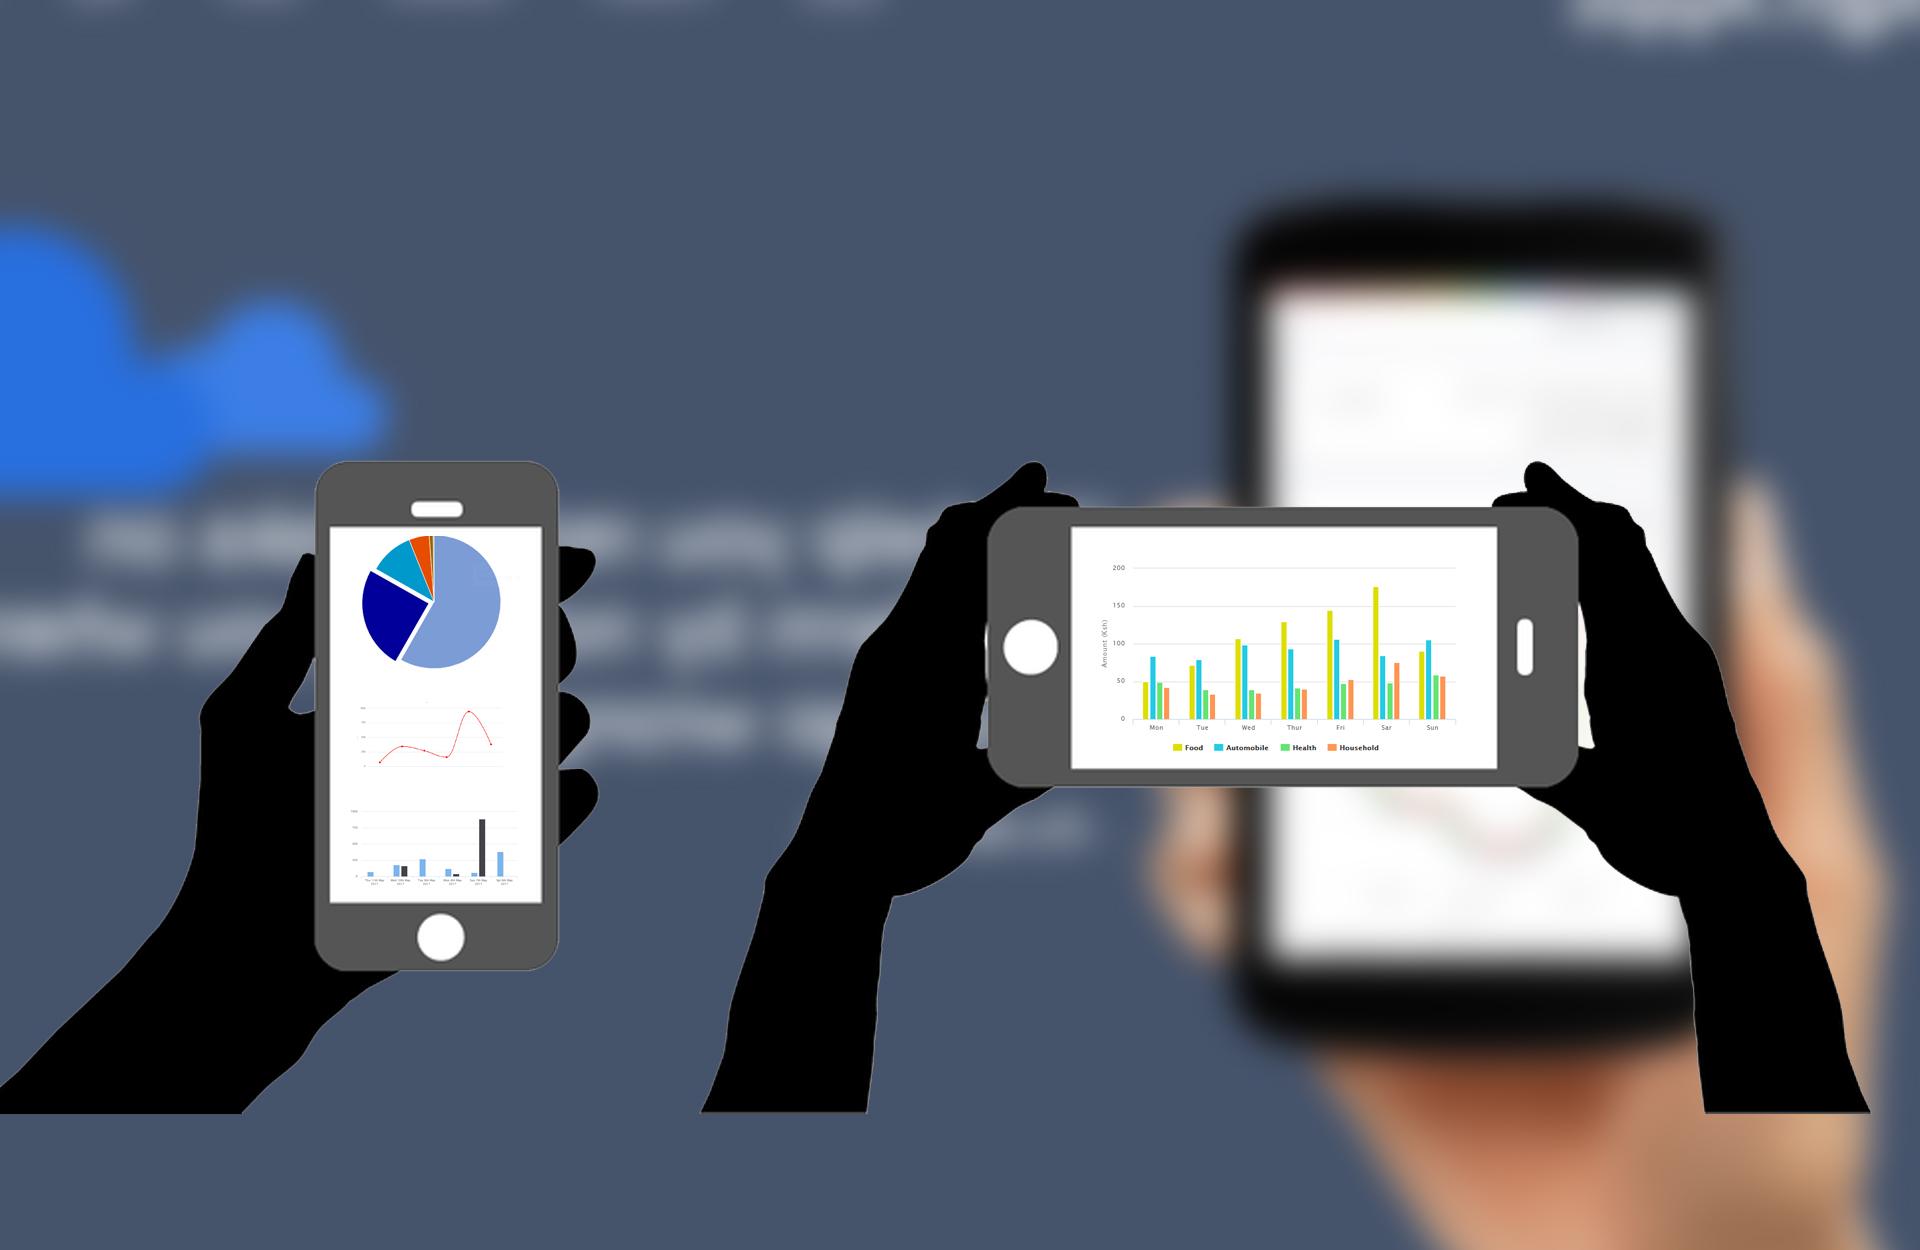 Cold storage Mobile App u0026 IoT monitoring & Solar Freeze